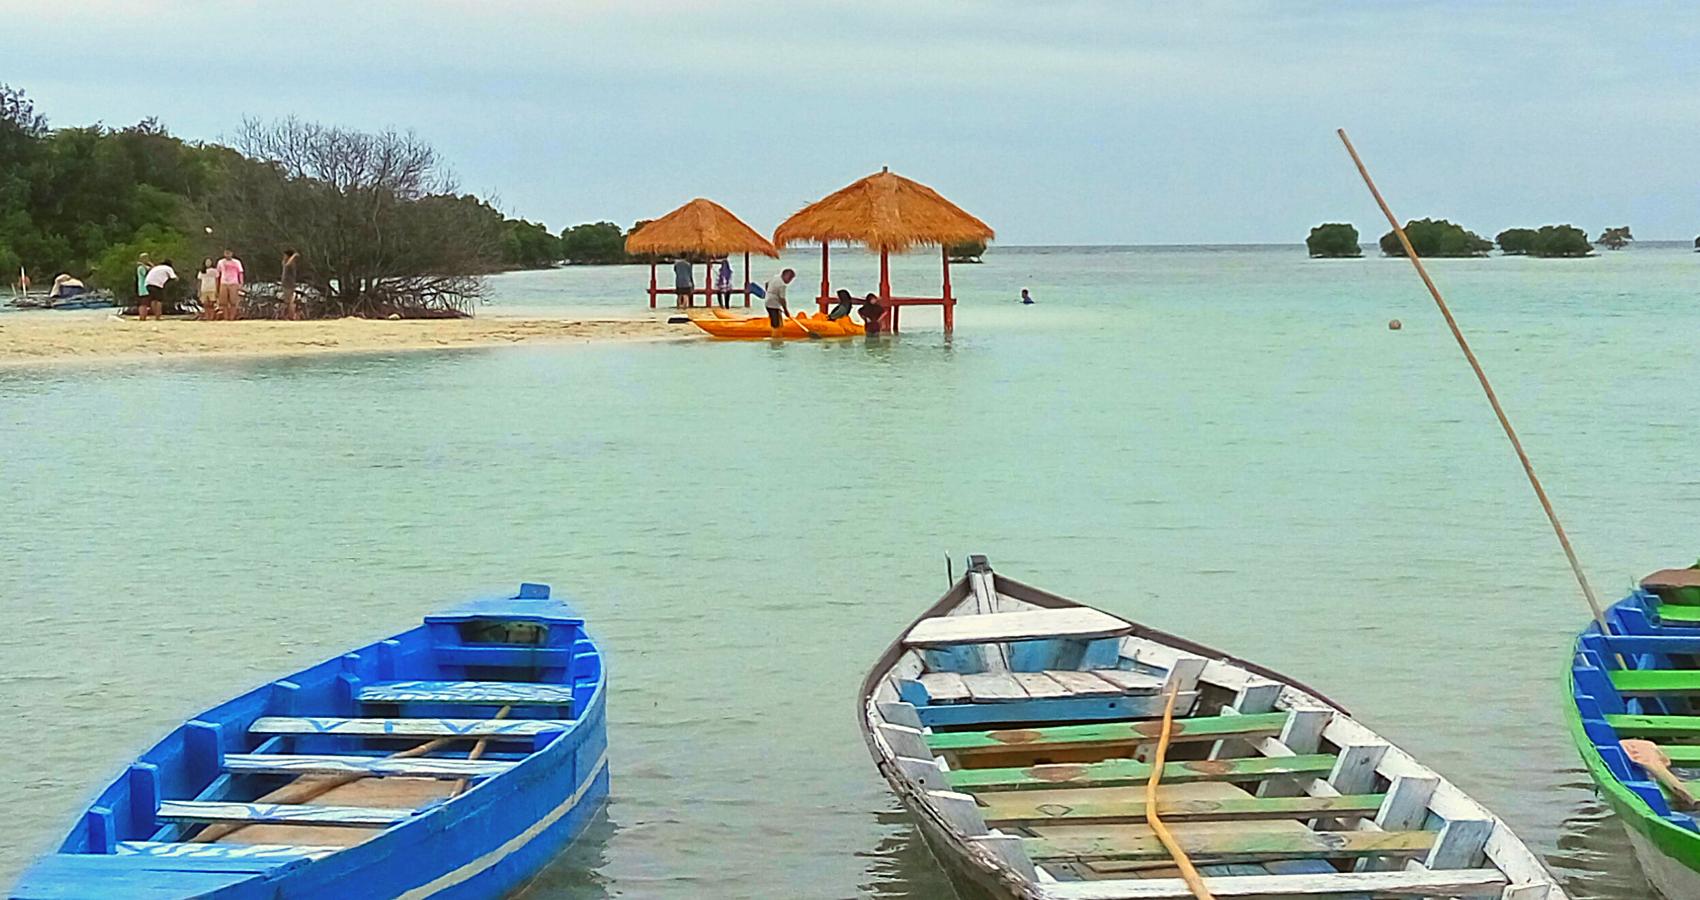 wisata pantai pulau pari